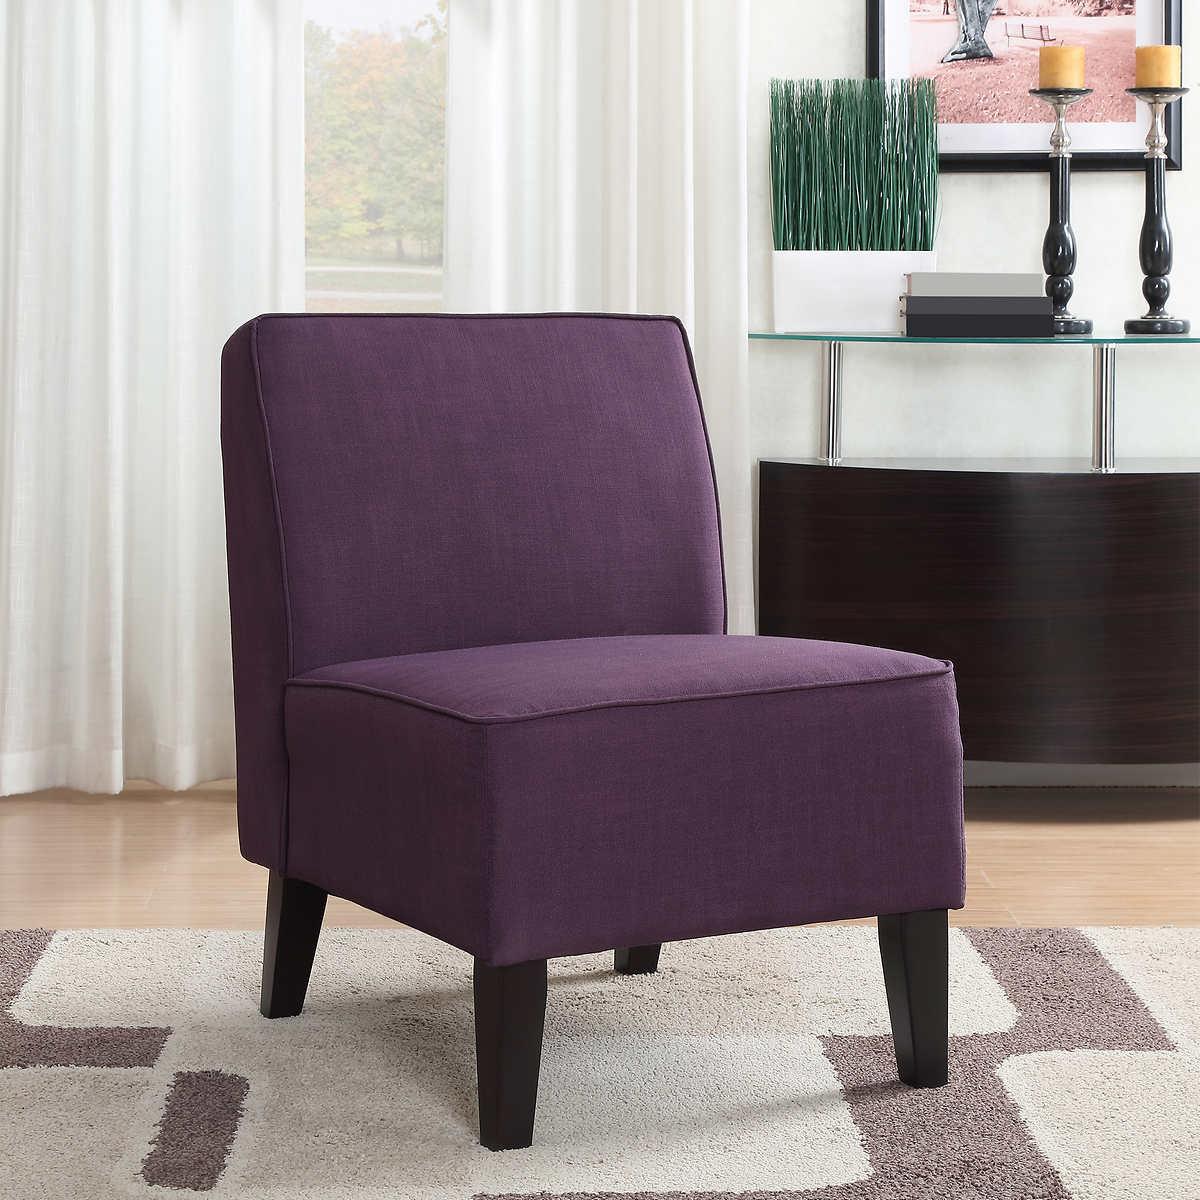 Roxbury Fabric Slipper Chair in Purple - Chairs Costco